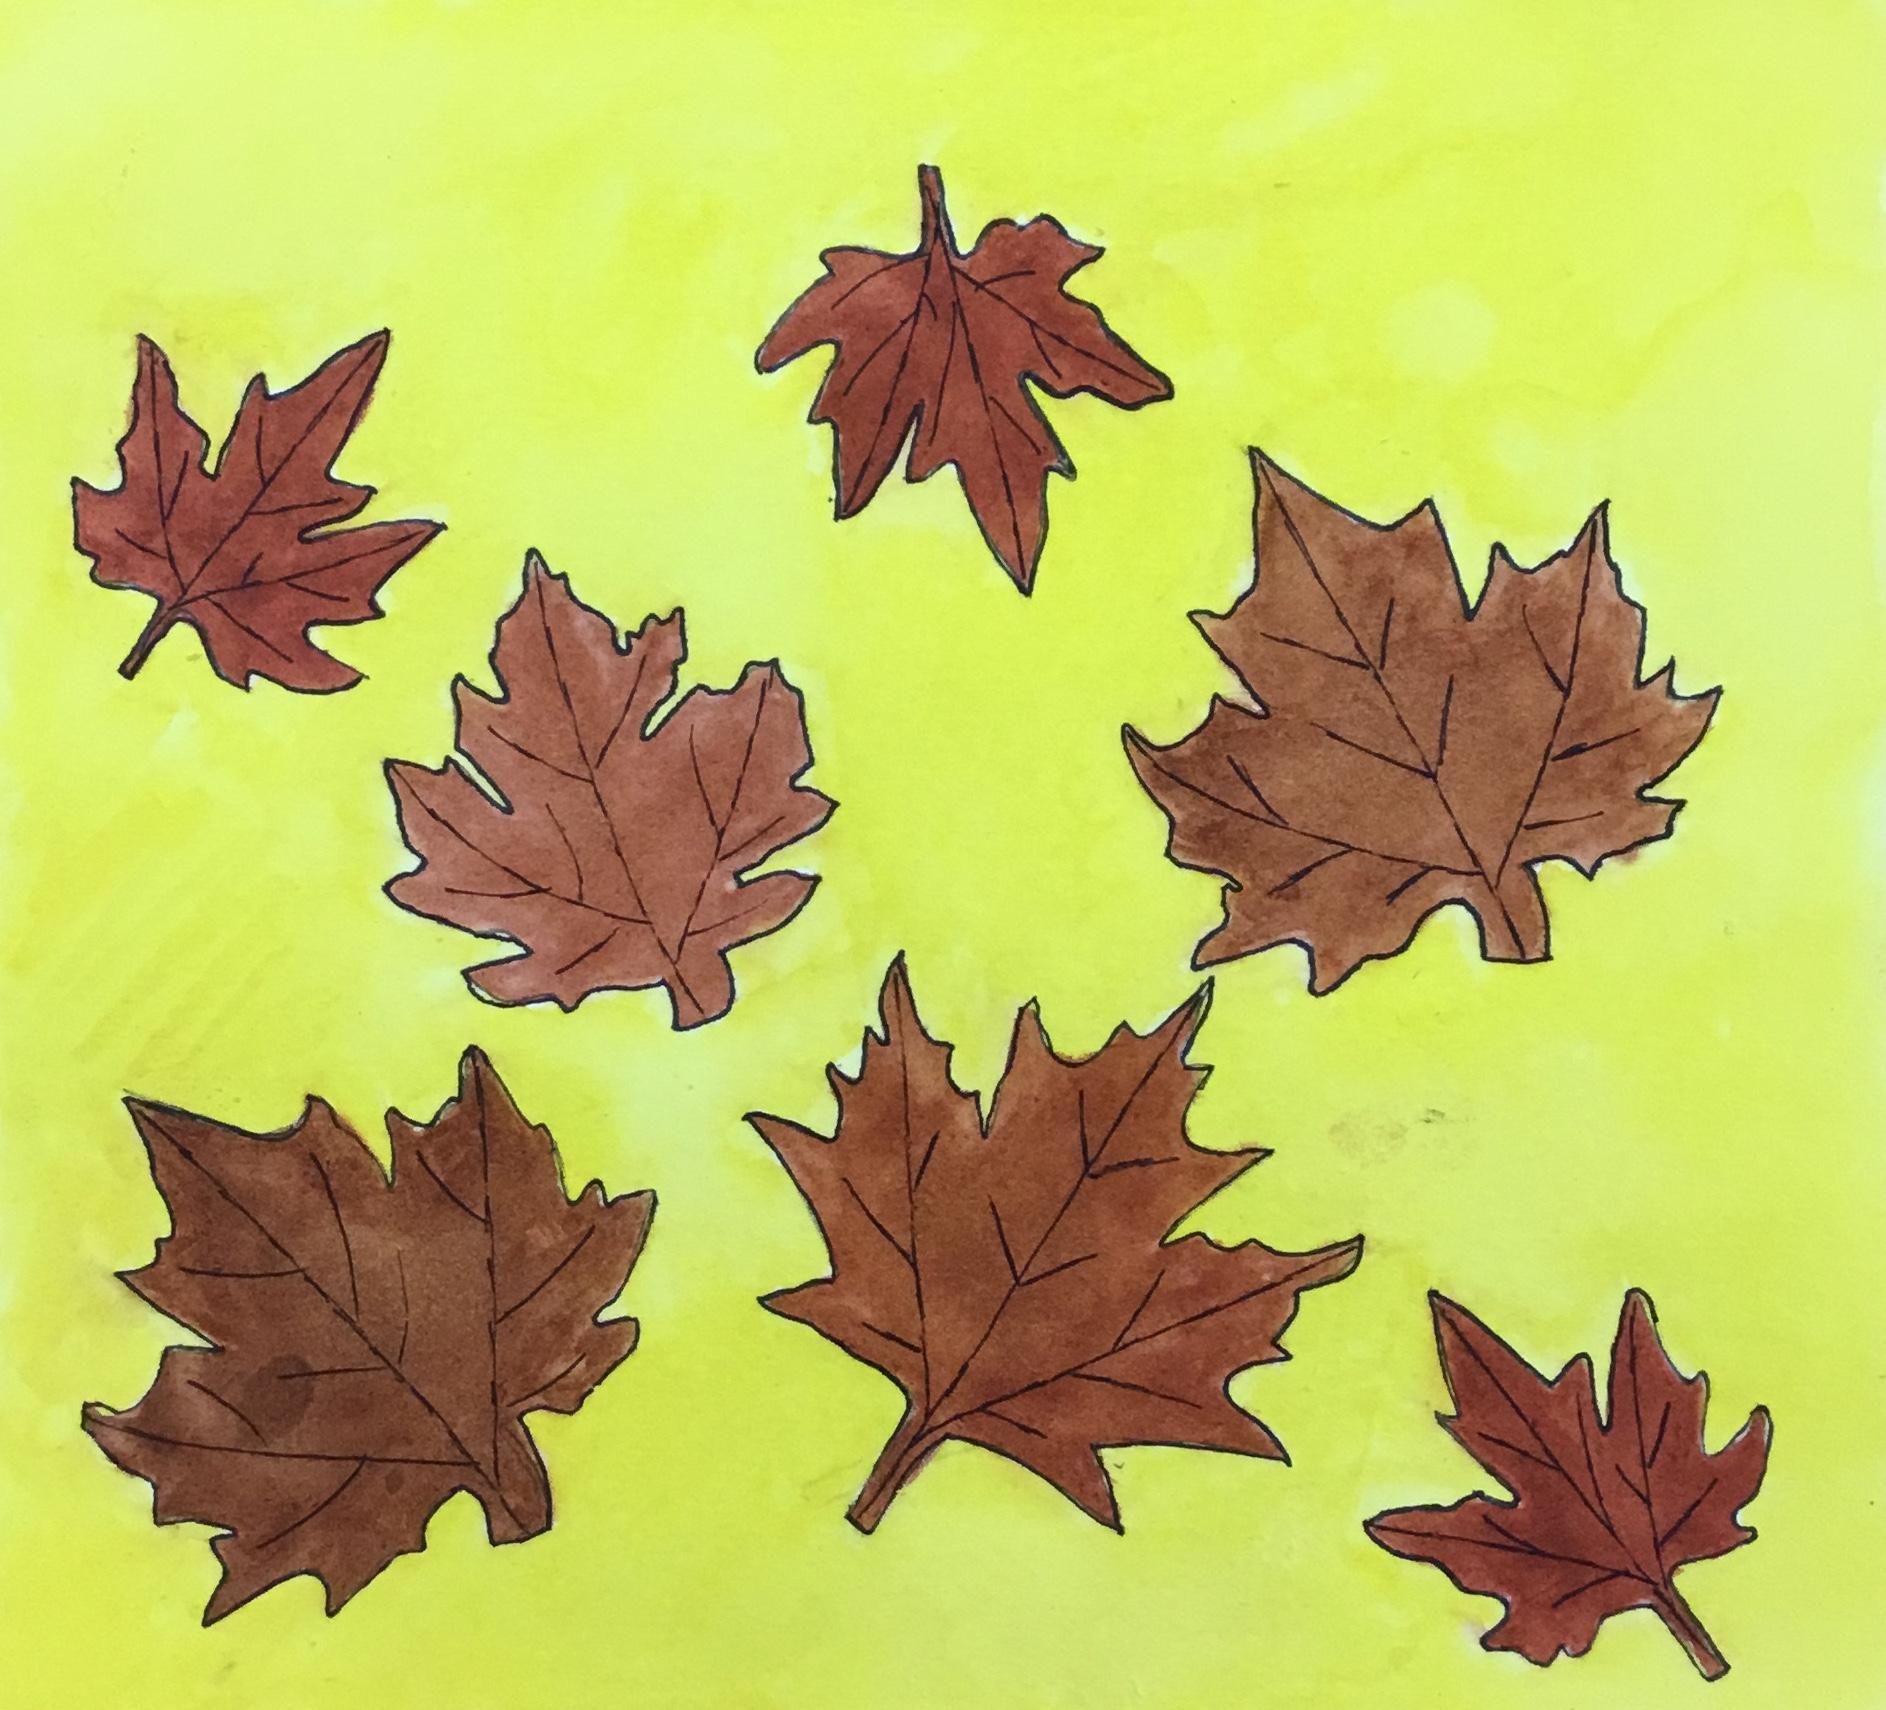 scattered fallen leaves watercolor